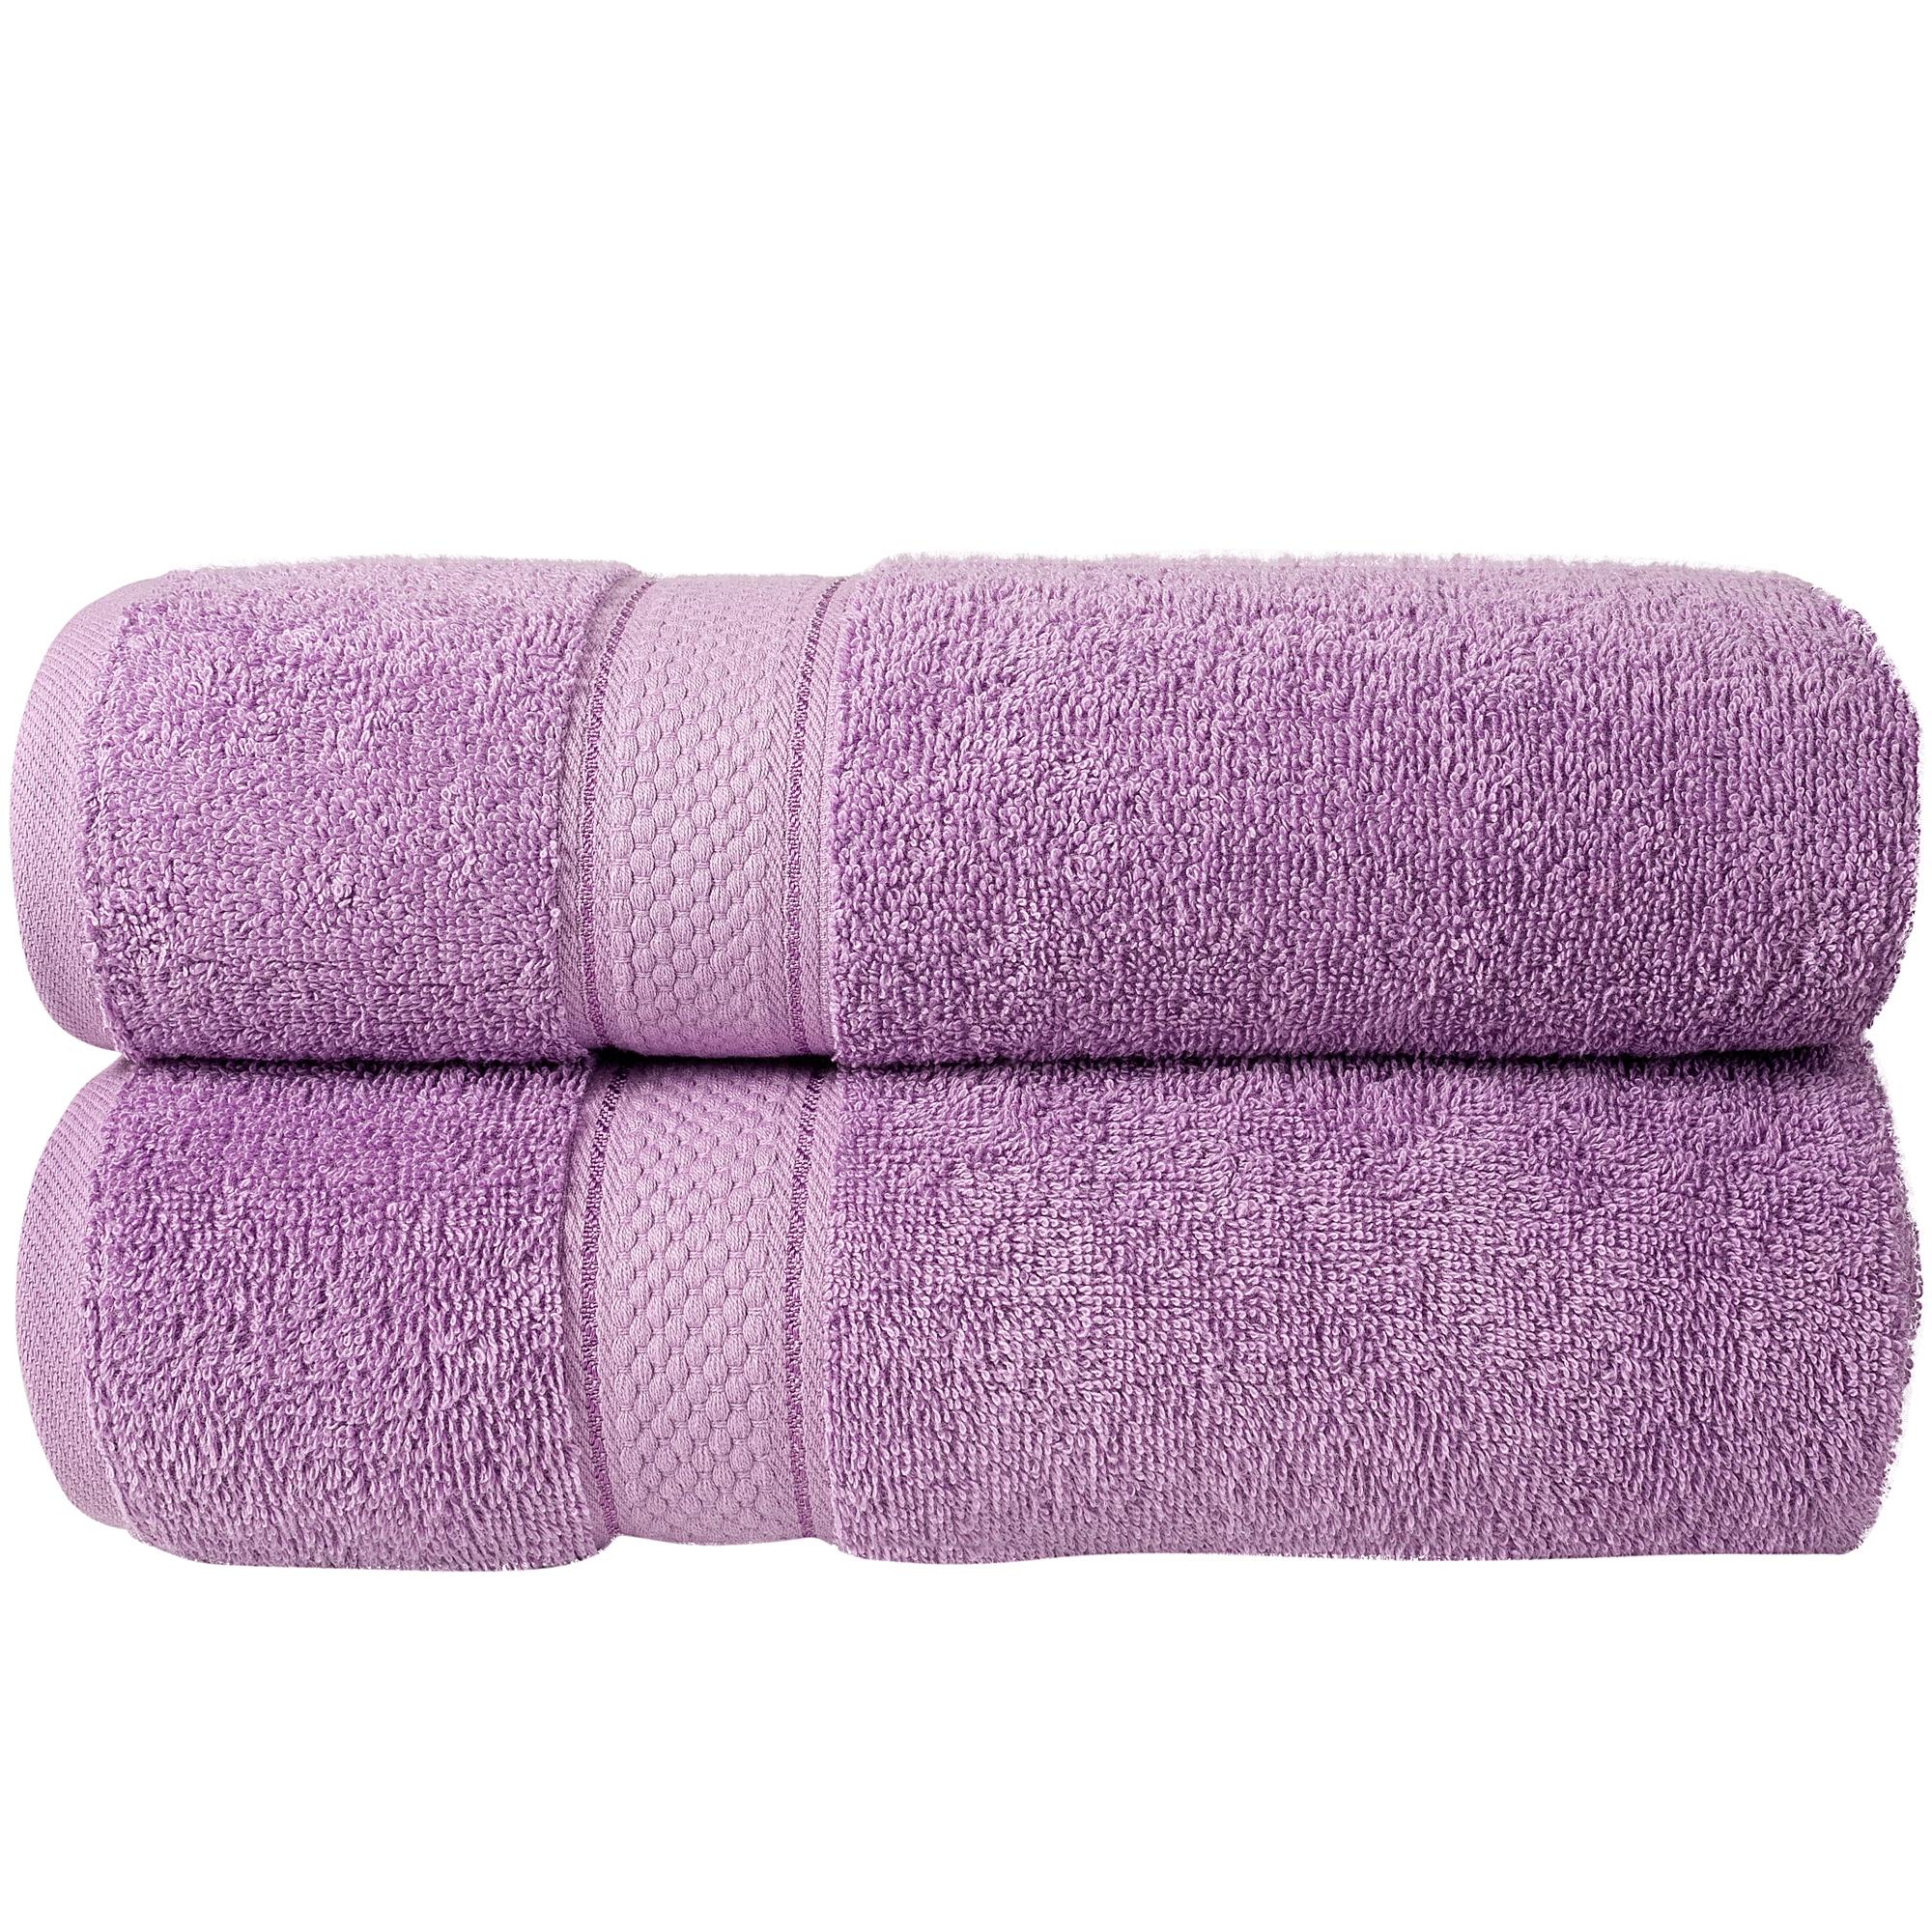 Bale Set 2pcs Lilac Plain Bath Towel